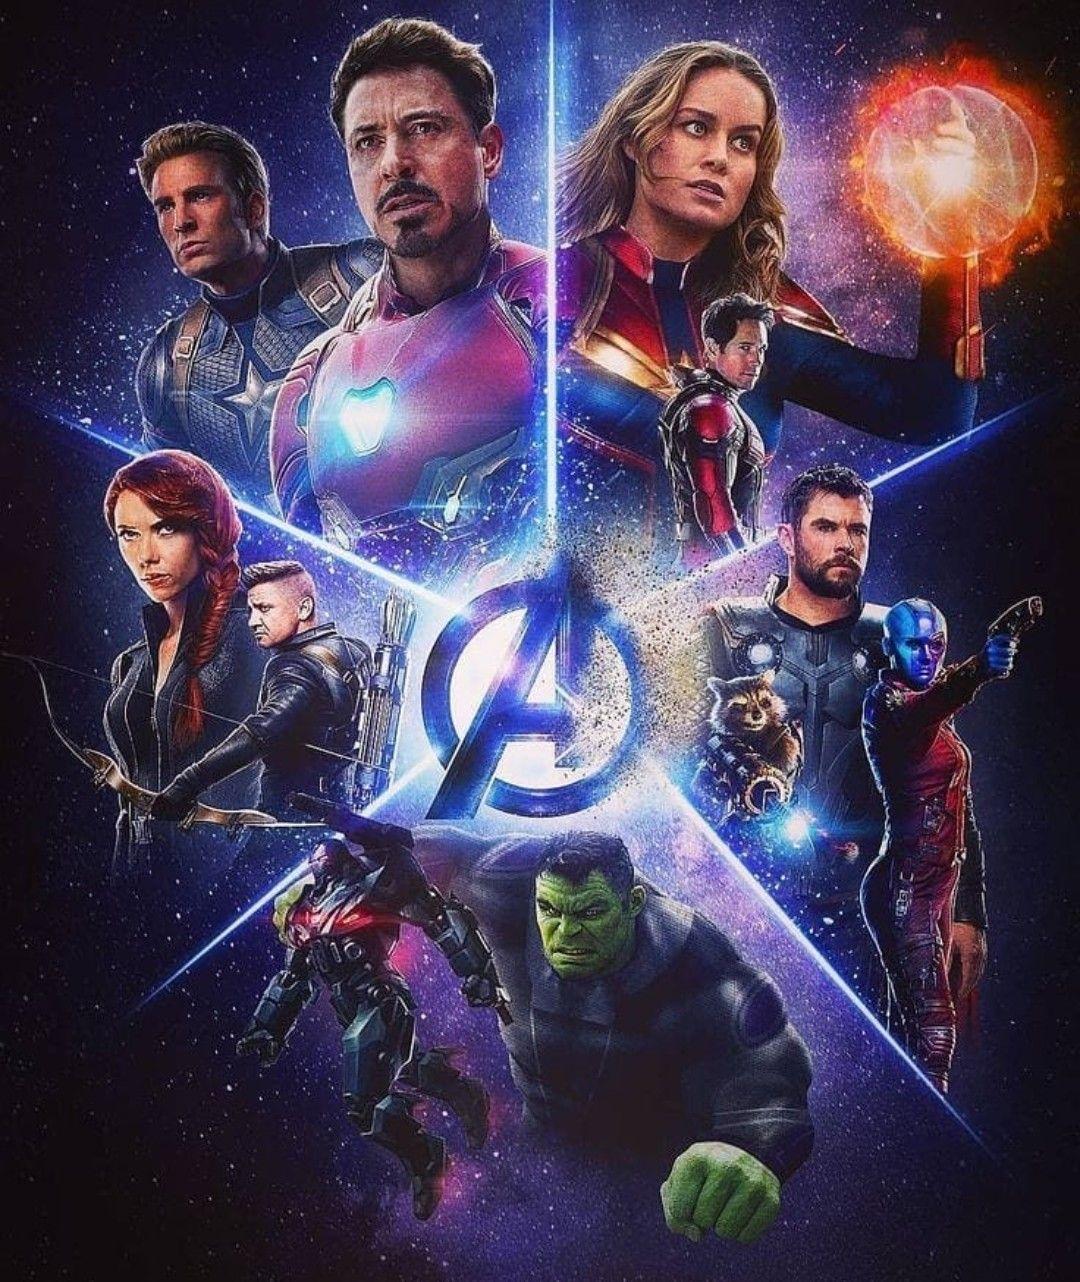 Pin de Luis en Superheroes Avengers, Personajes de